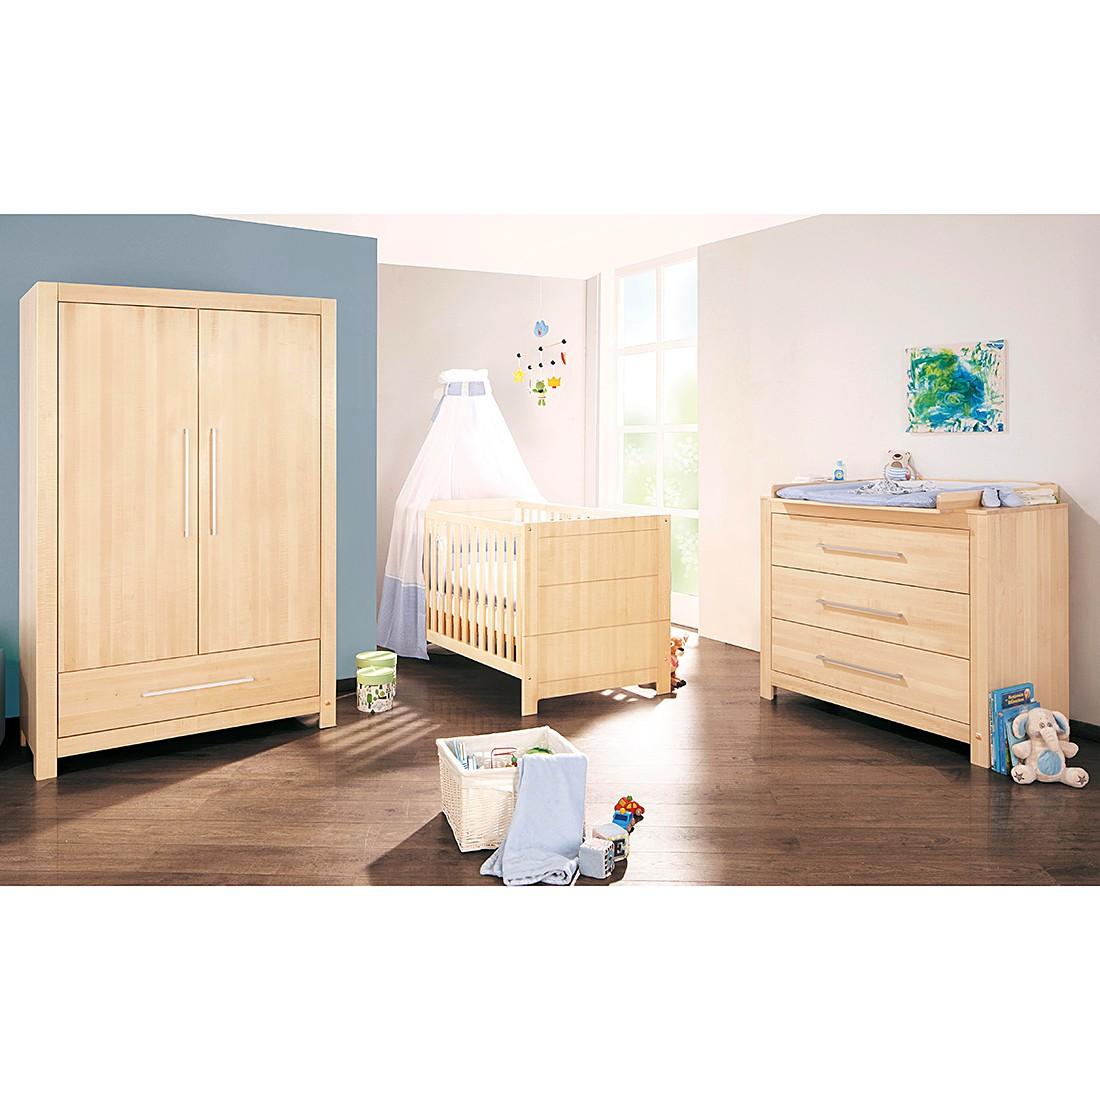 wickelkommode nick ahorn pinolino m pi 000067 m bel8. Black Bedroom Furniture Sets. Home Design Ideas